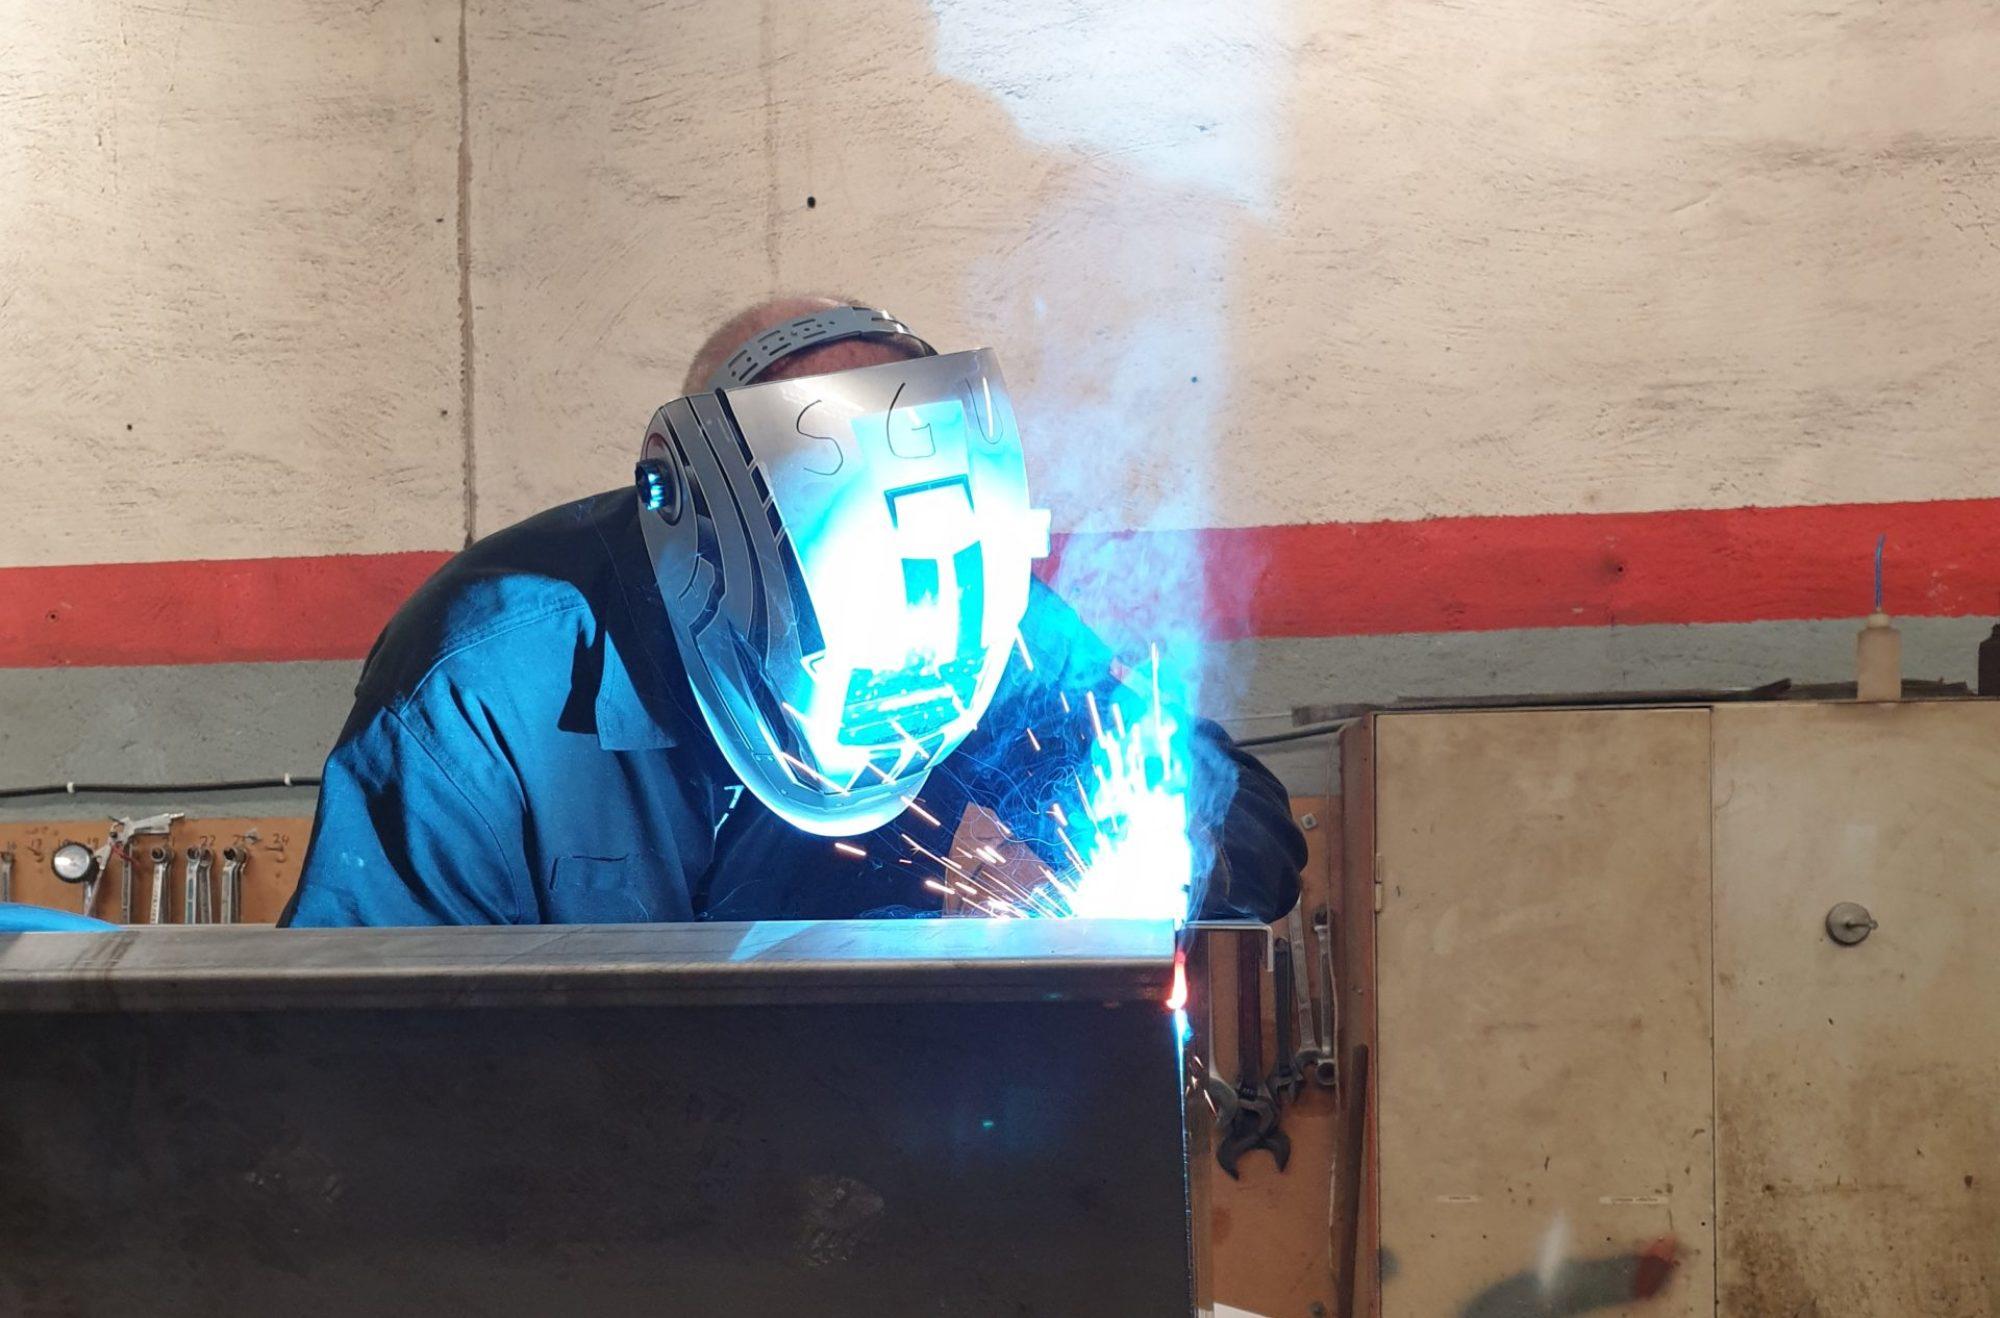 Bohusläns Industriservice AB